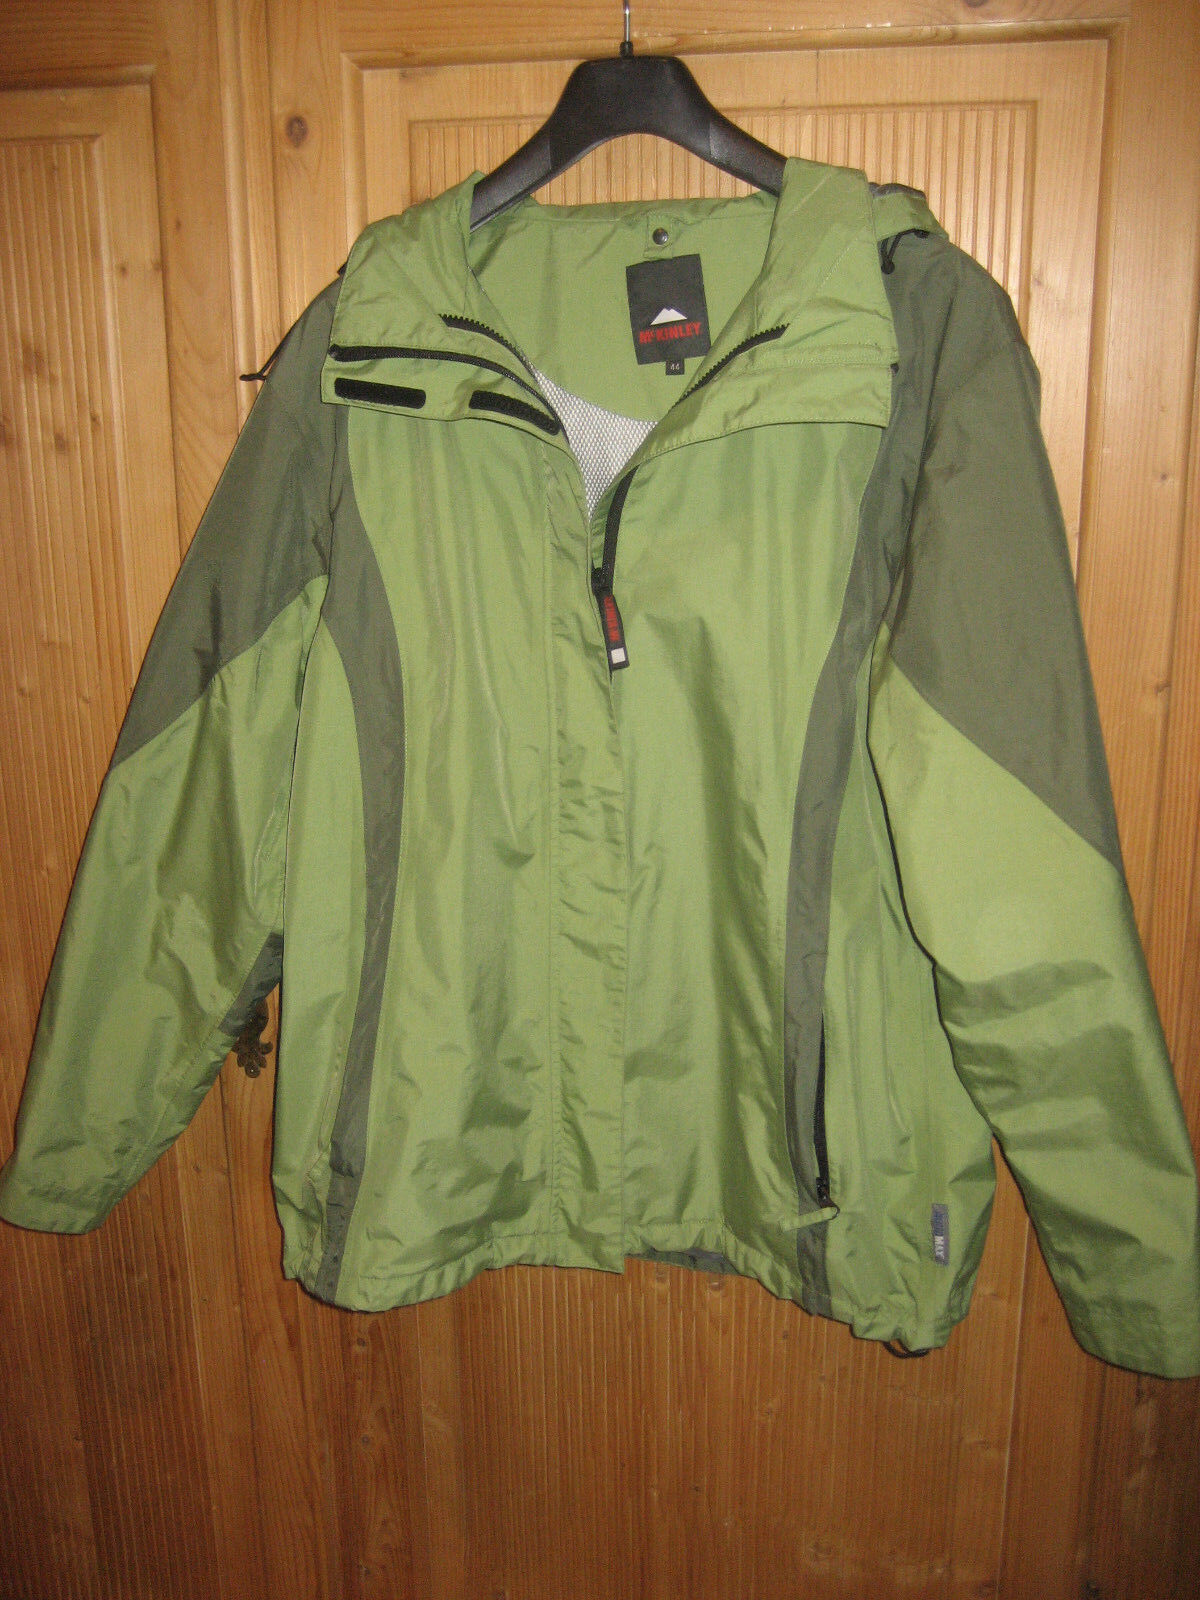 Mc Kinley Jacke Trekkingjacke Größe 44 grün Allwetterjacke wind- und wasserdicht